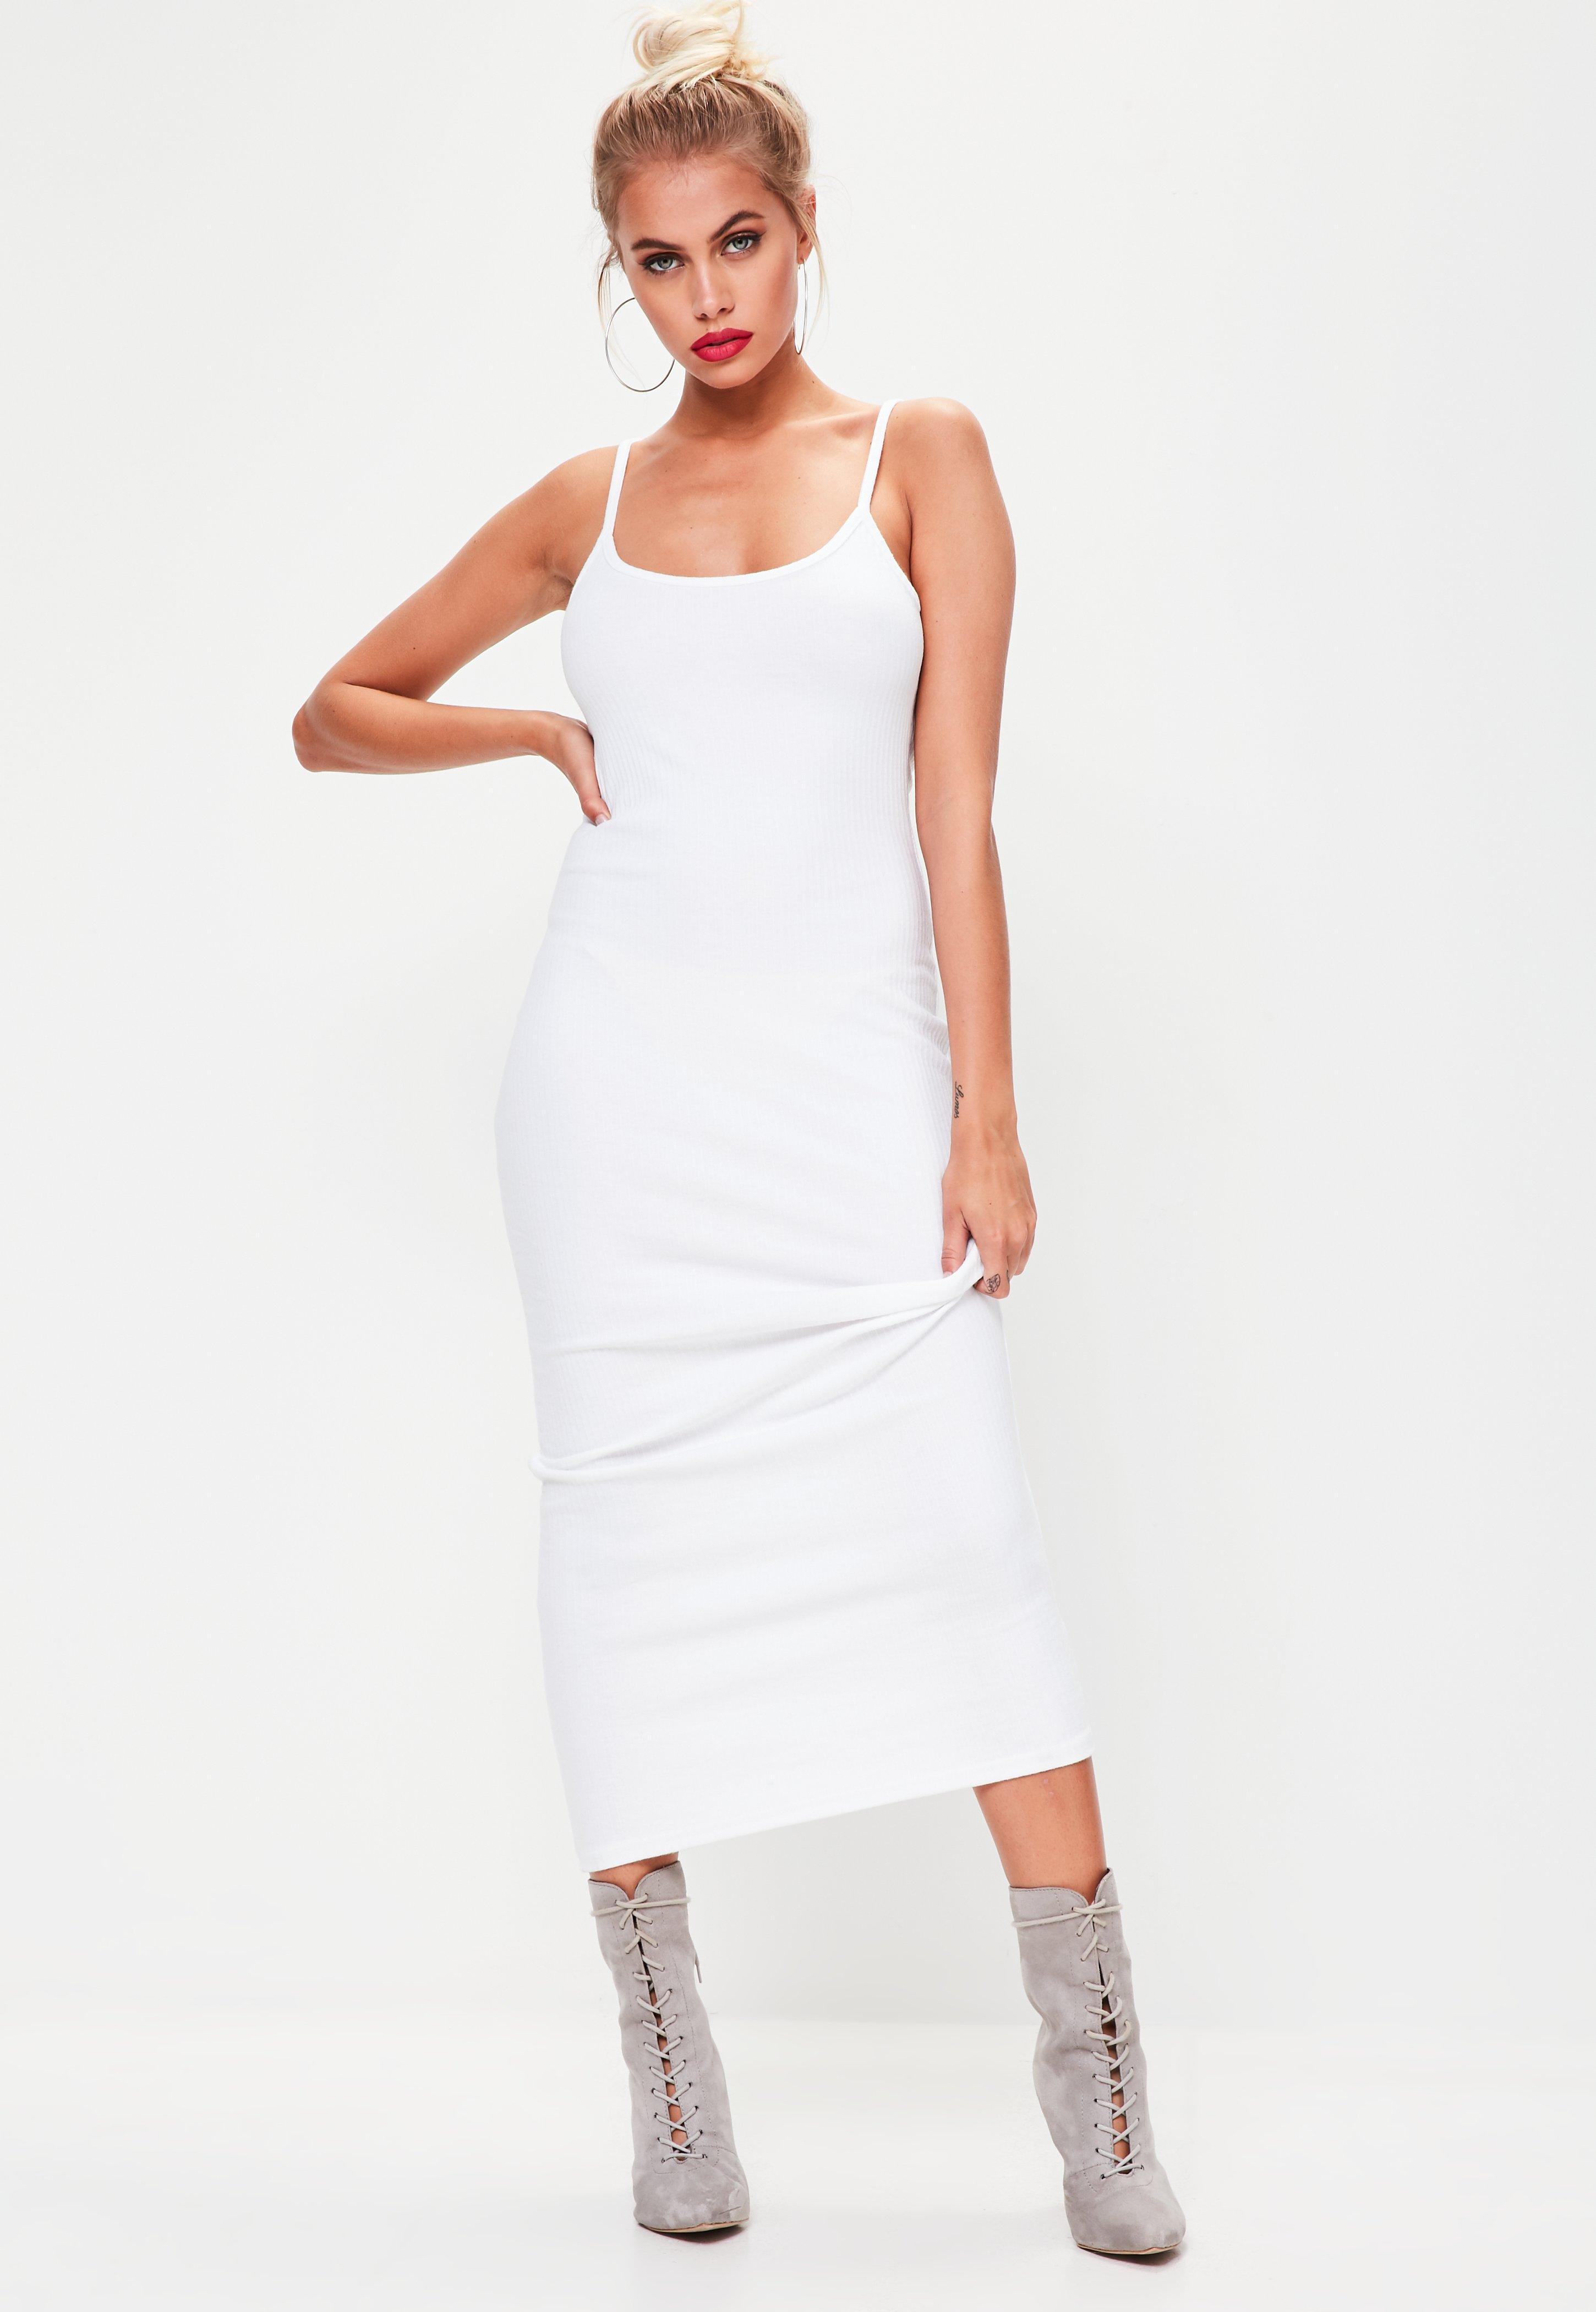 Fond de robe blanche pas cher